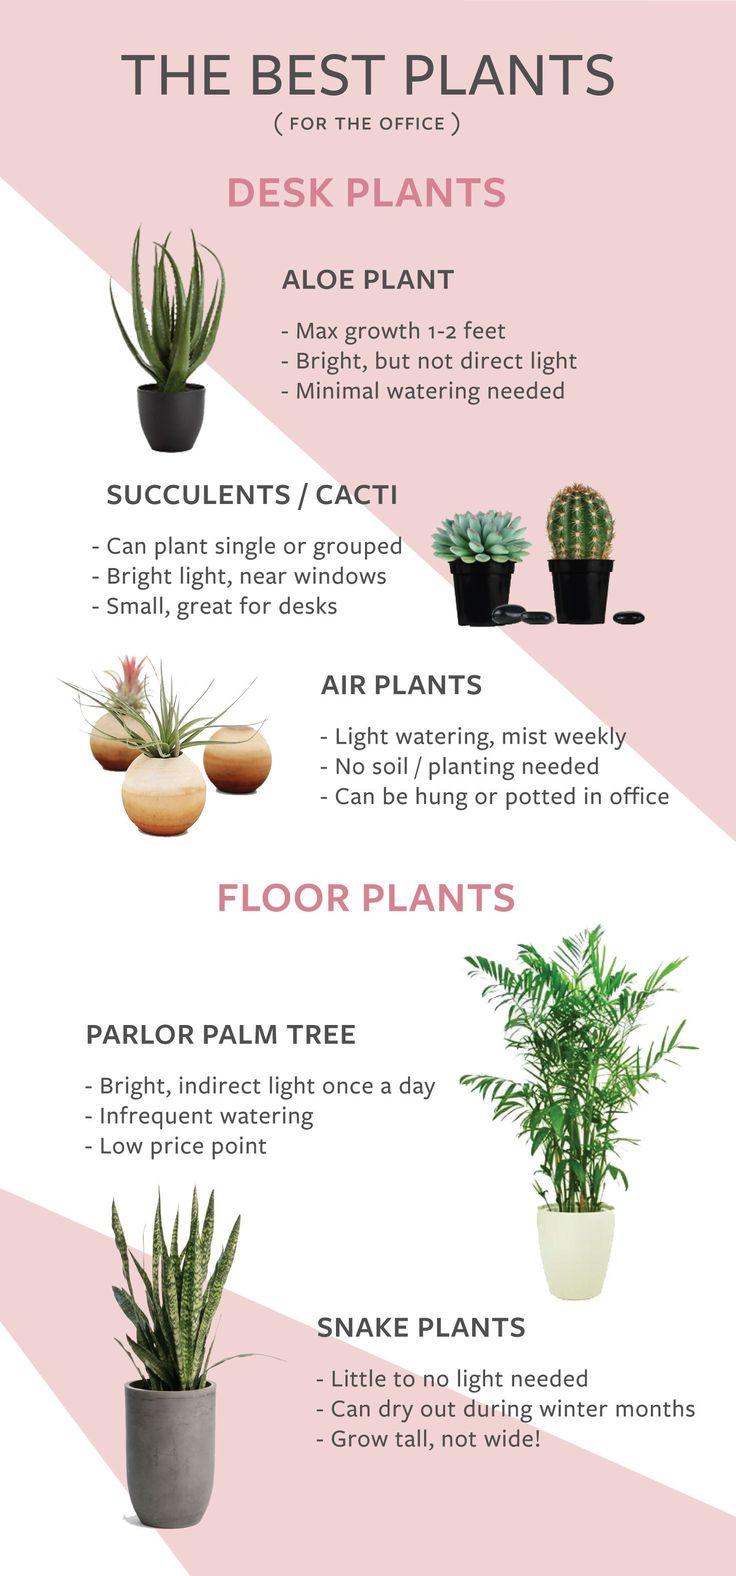 Best 25 Office Plants Ideas On Pinterest Plants Indoor Inside Plants And Low Light Plants